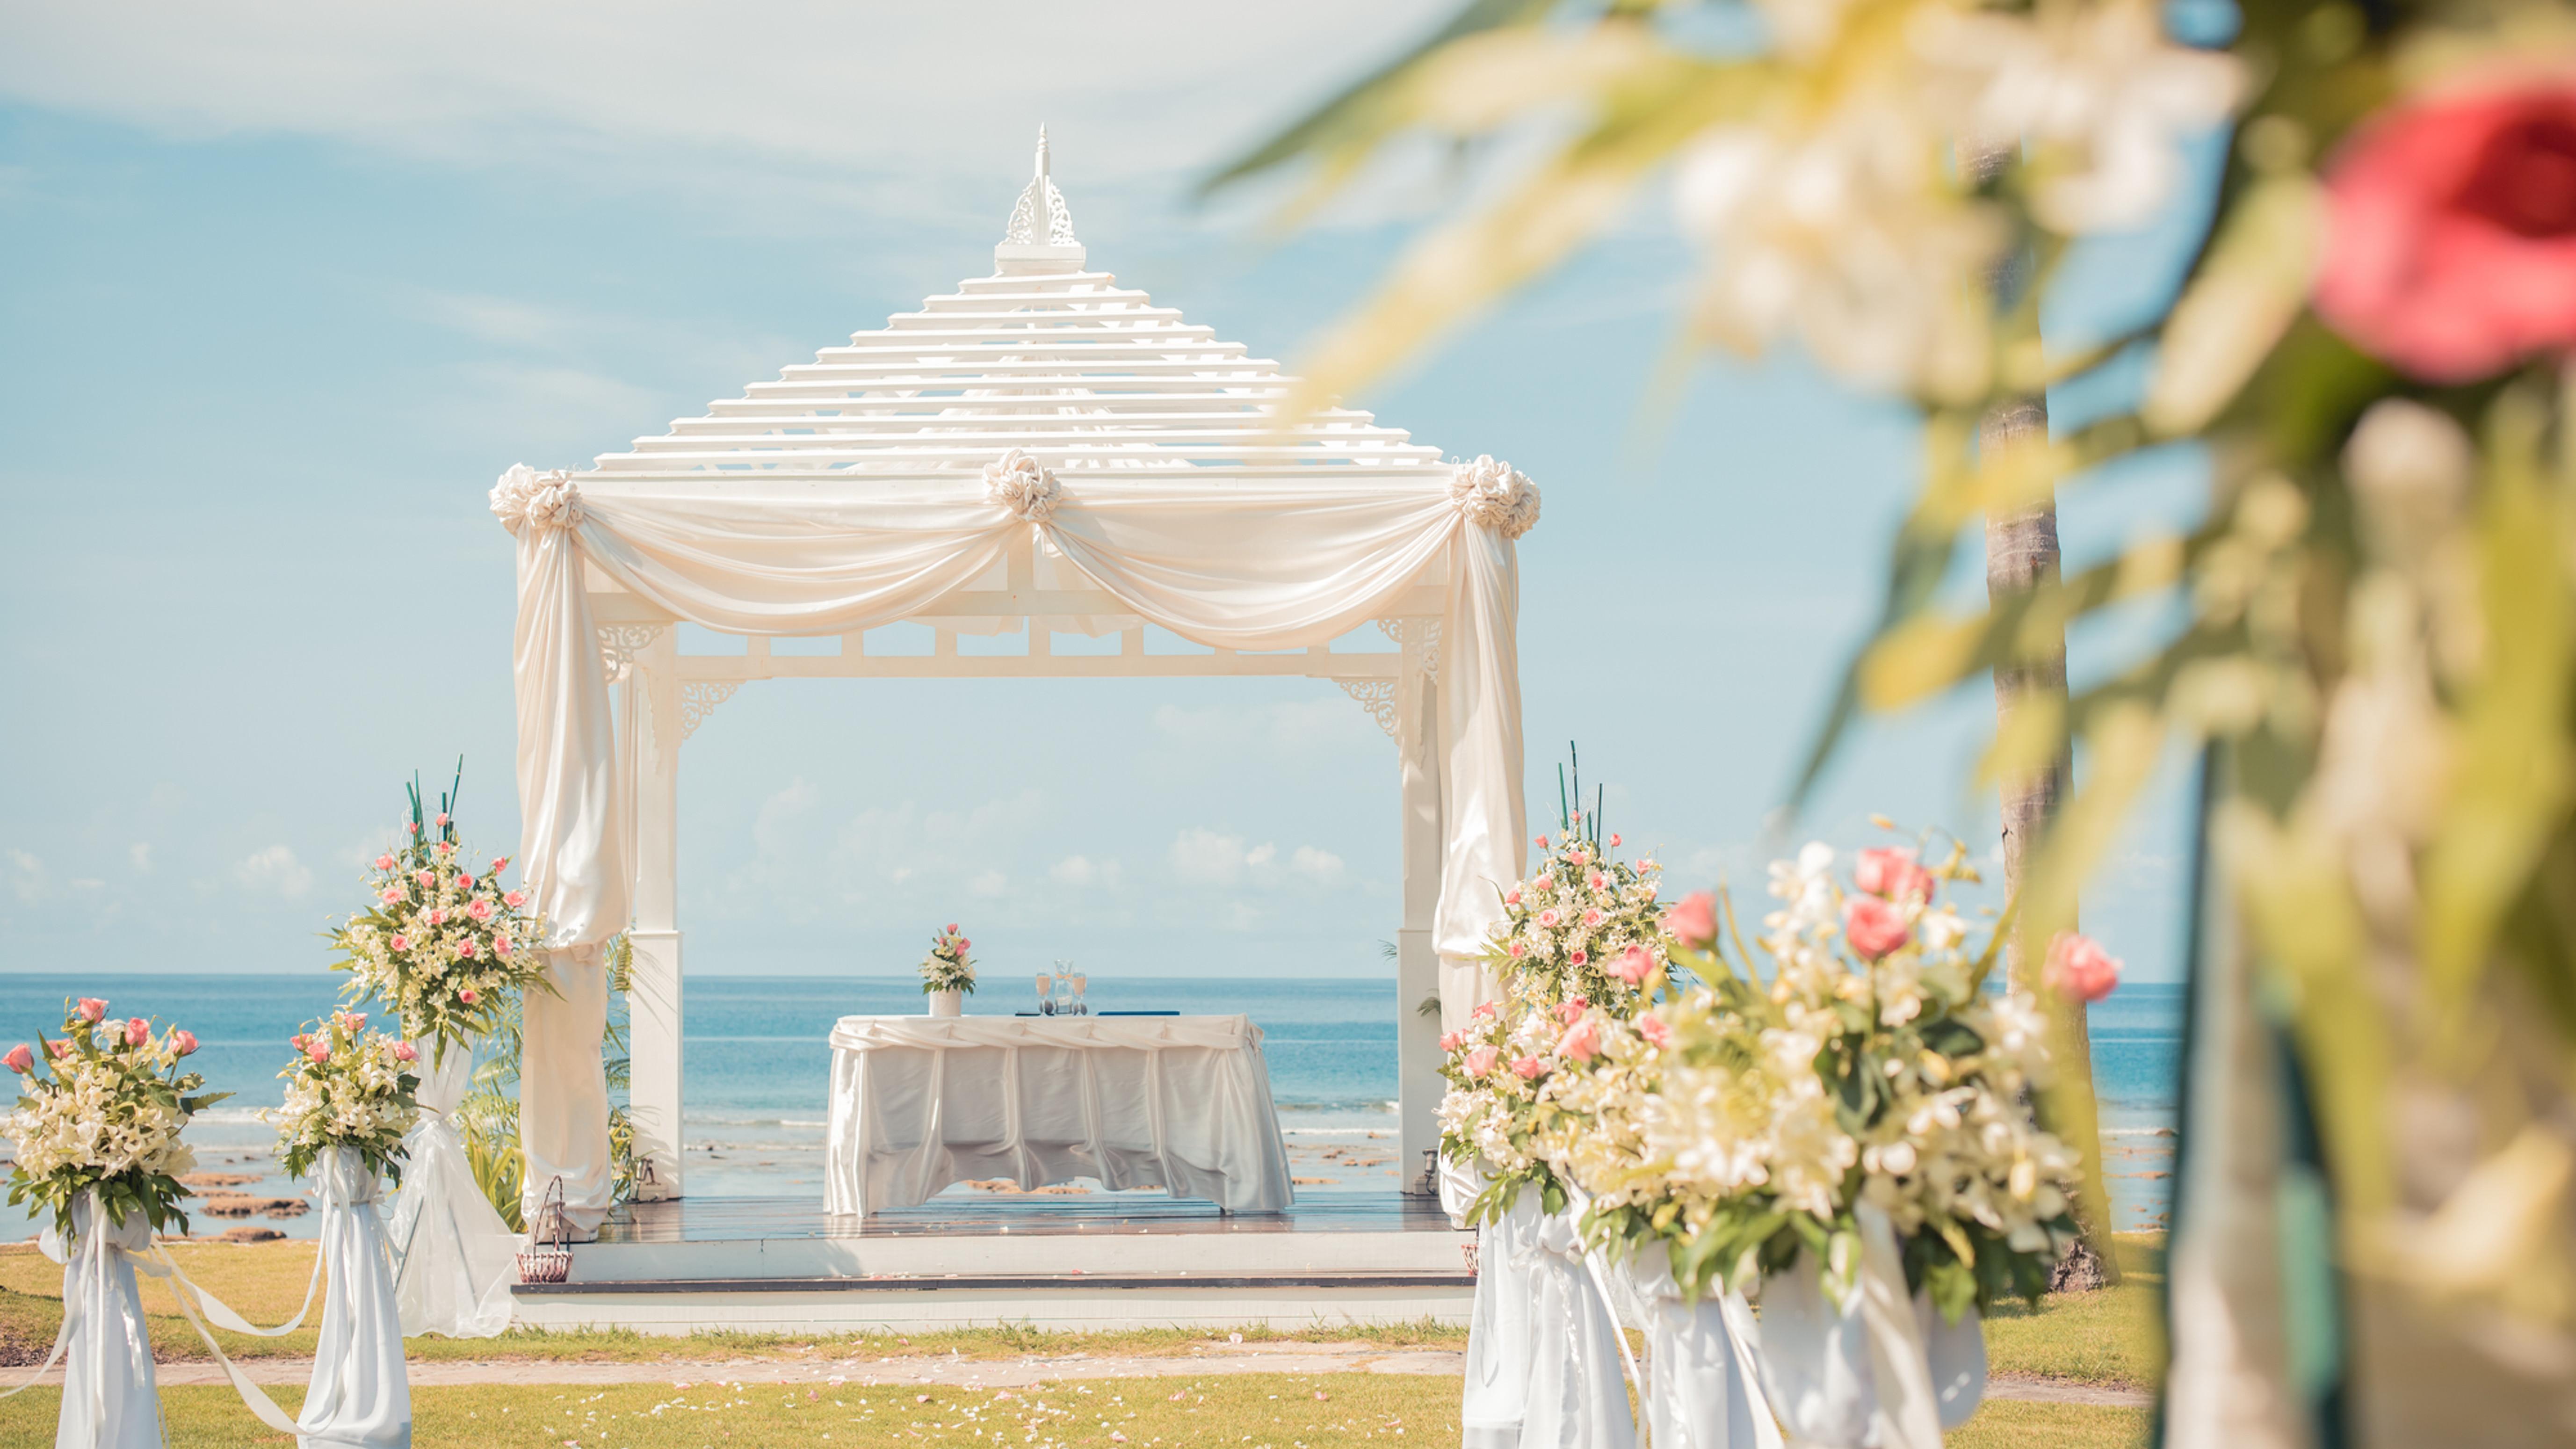 Wedding Ceremony PA System